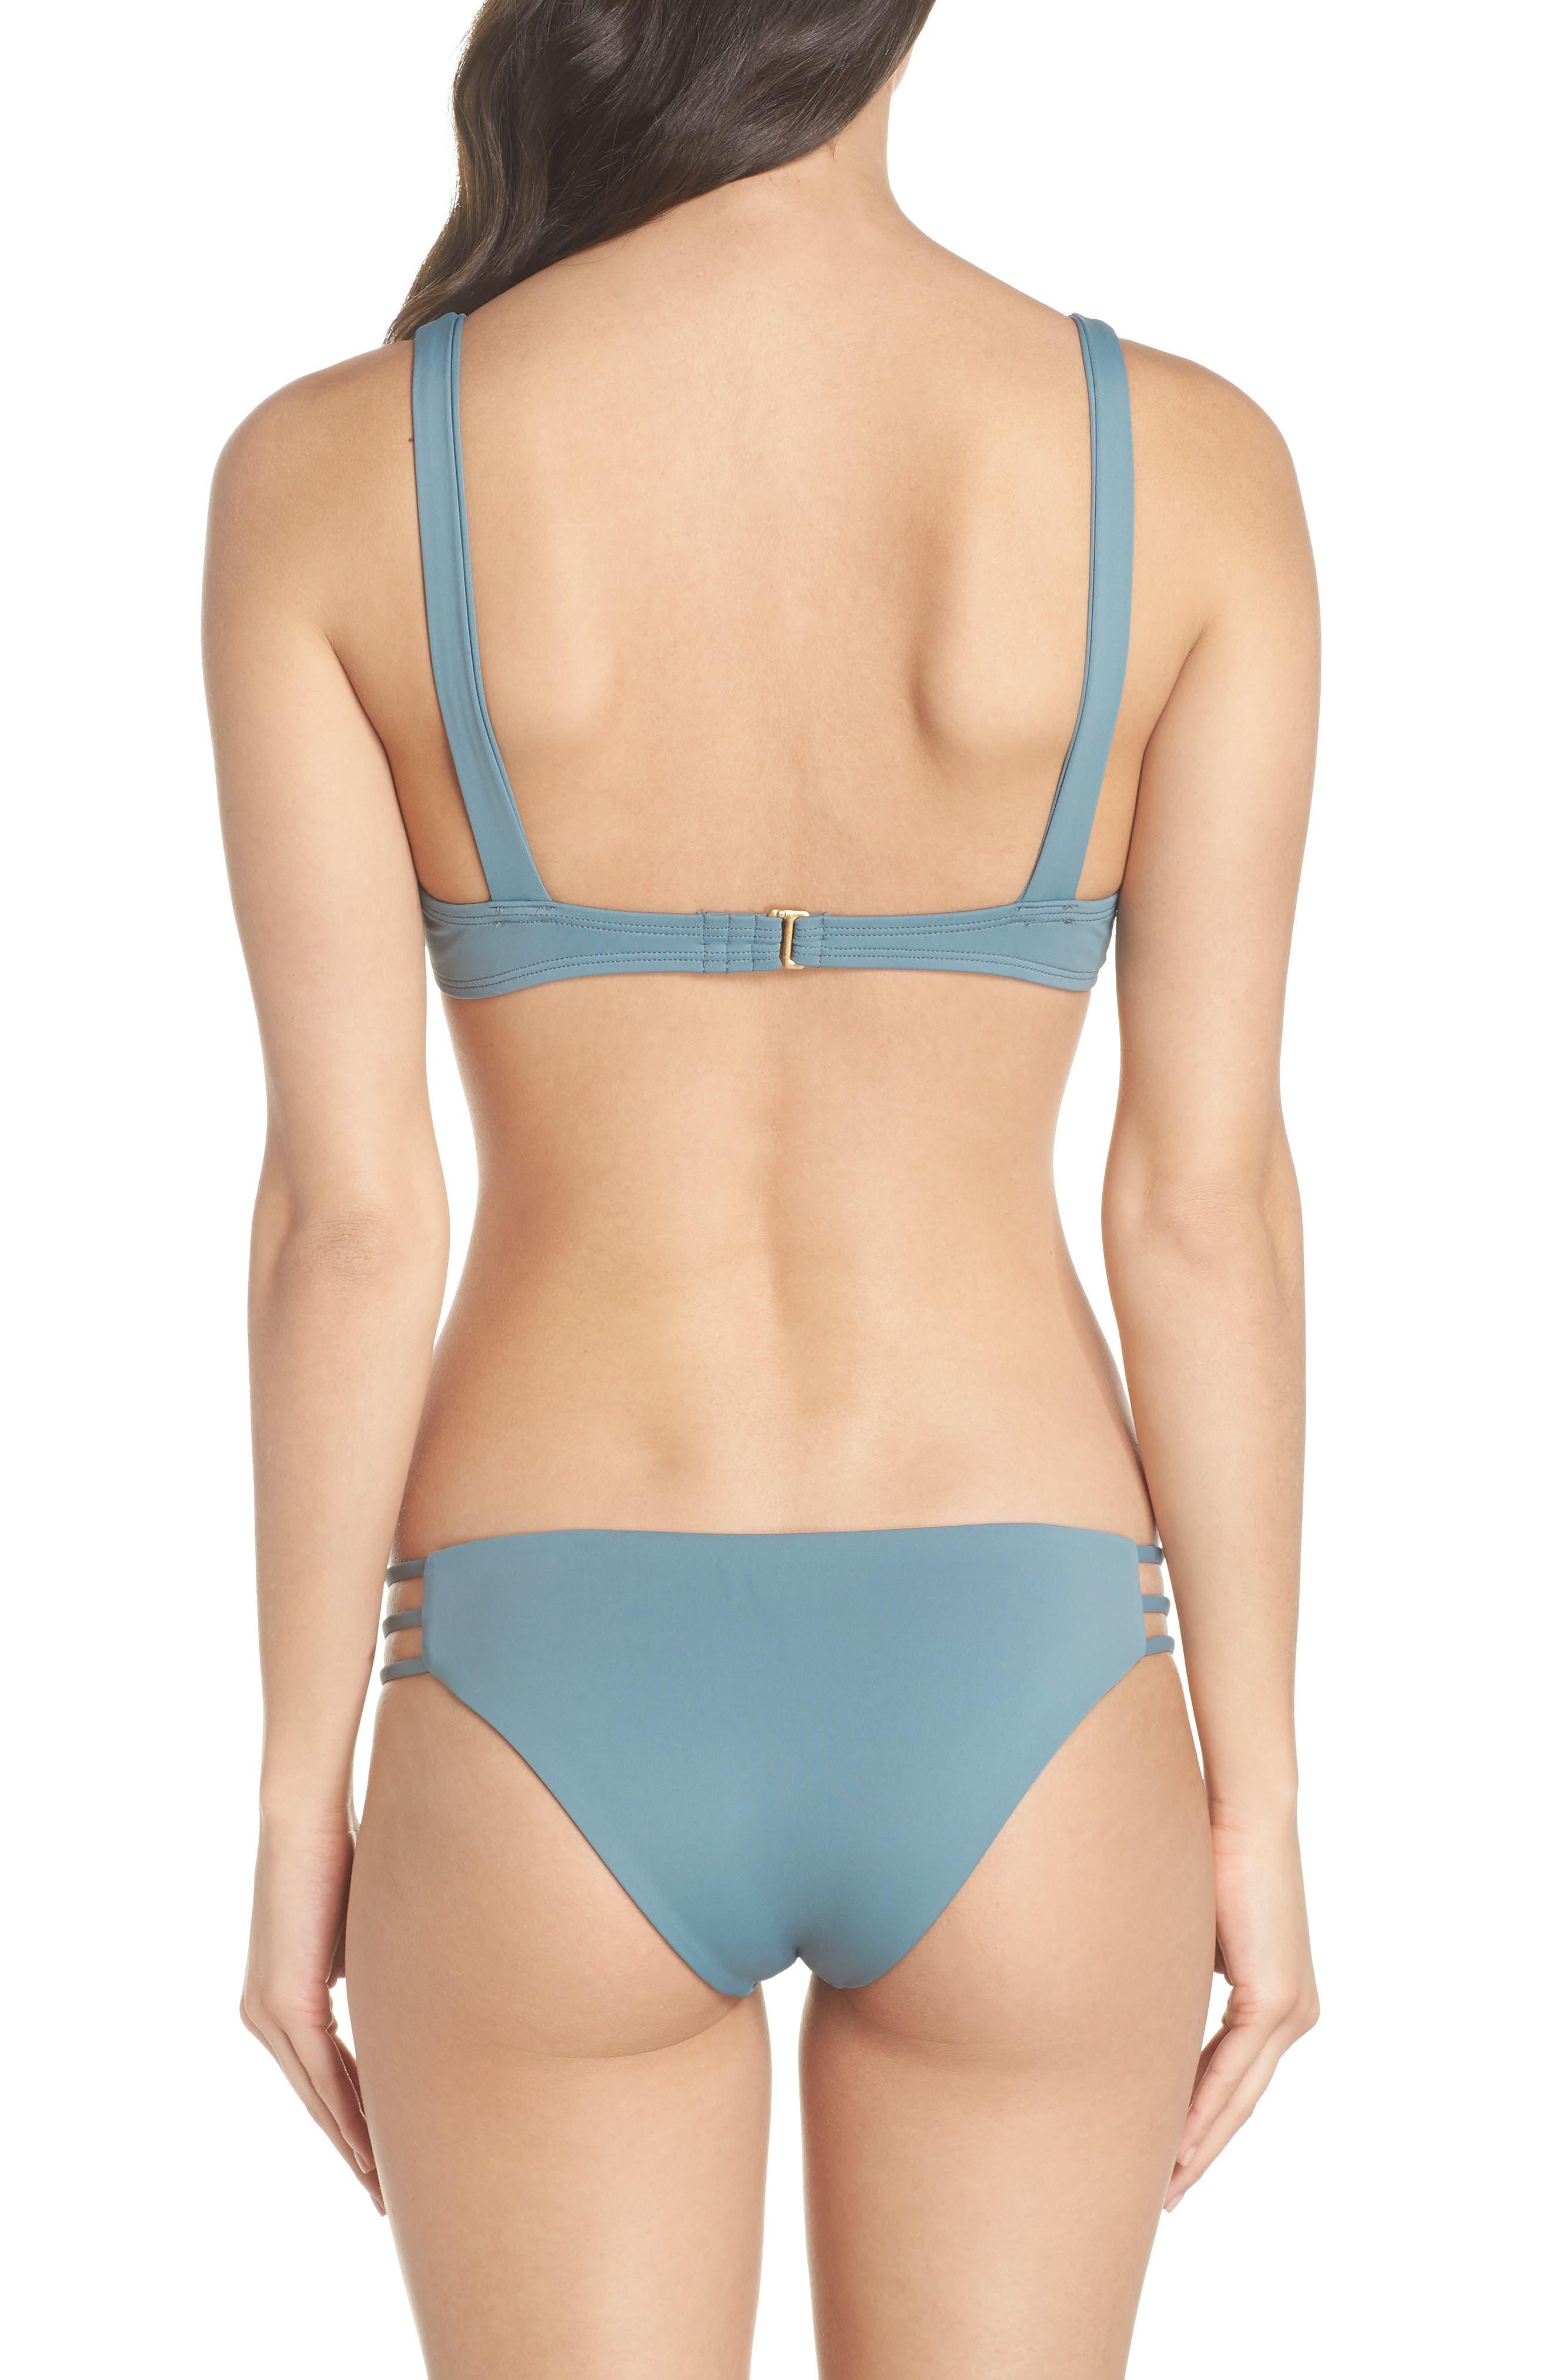 Monroe Bikini Top,                             Alternate thumbnail 8, color,                             SLATED GLASS